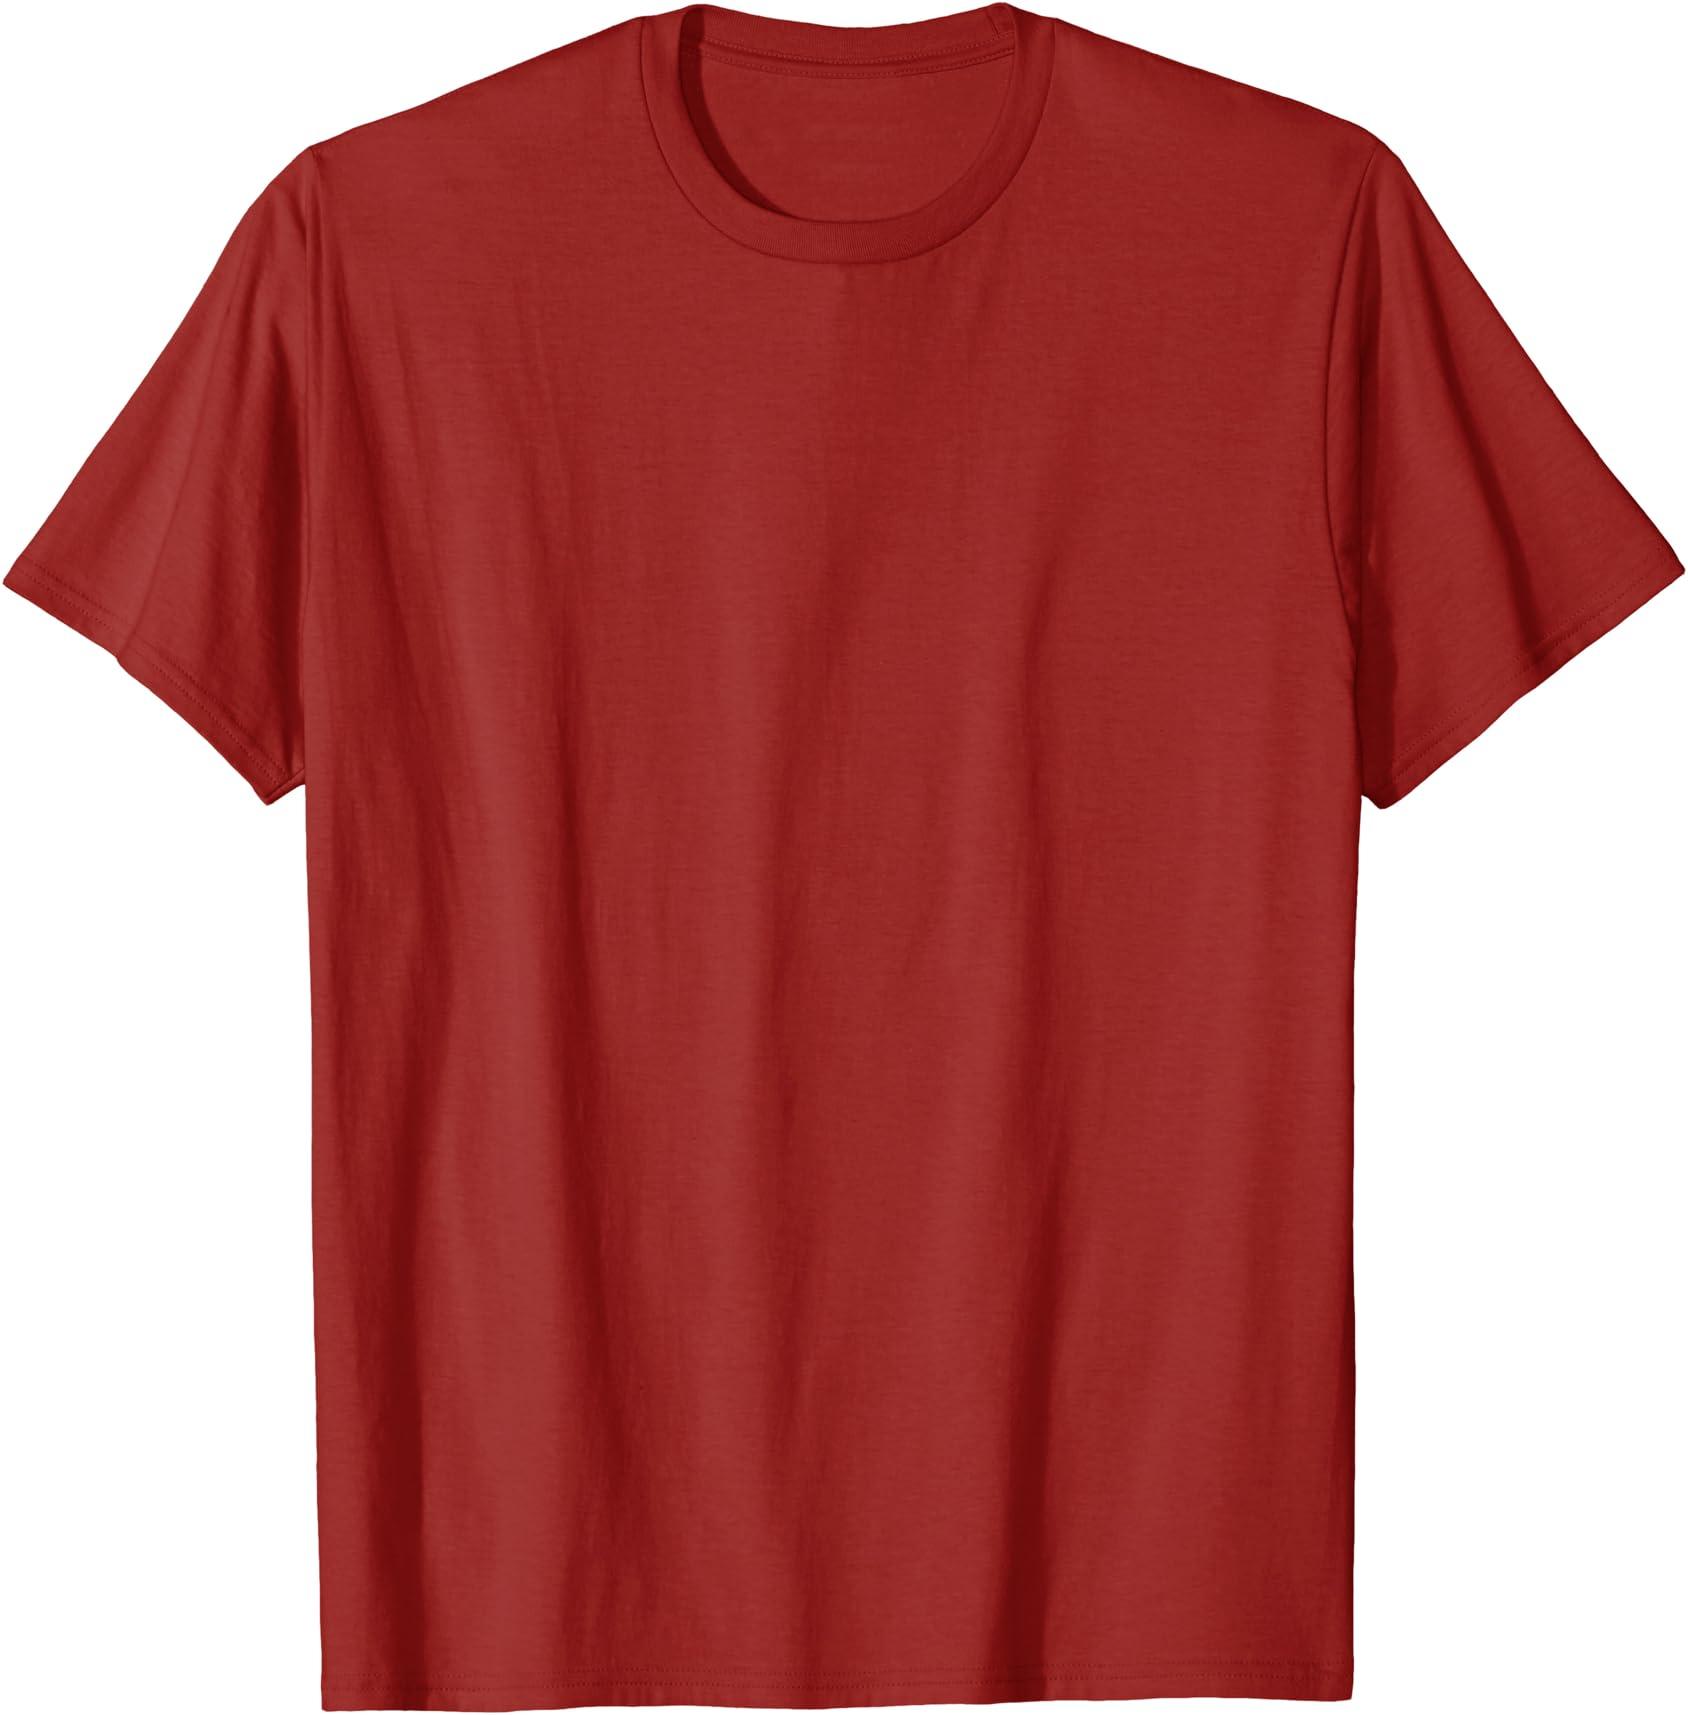 Batman NEW ROBIN UNIFORM Costume Licensed Adult T-Shirt All Sizes